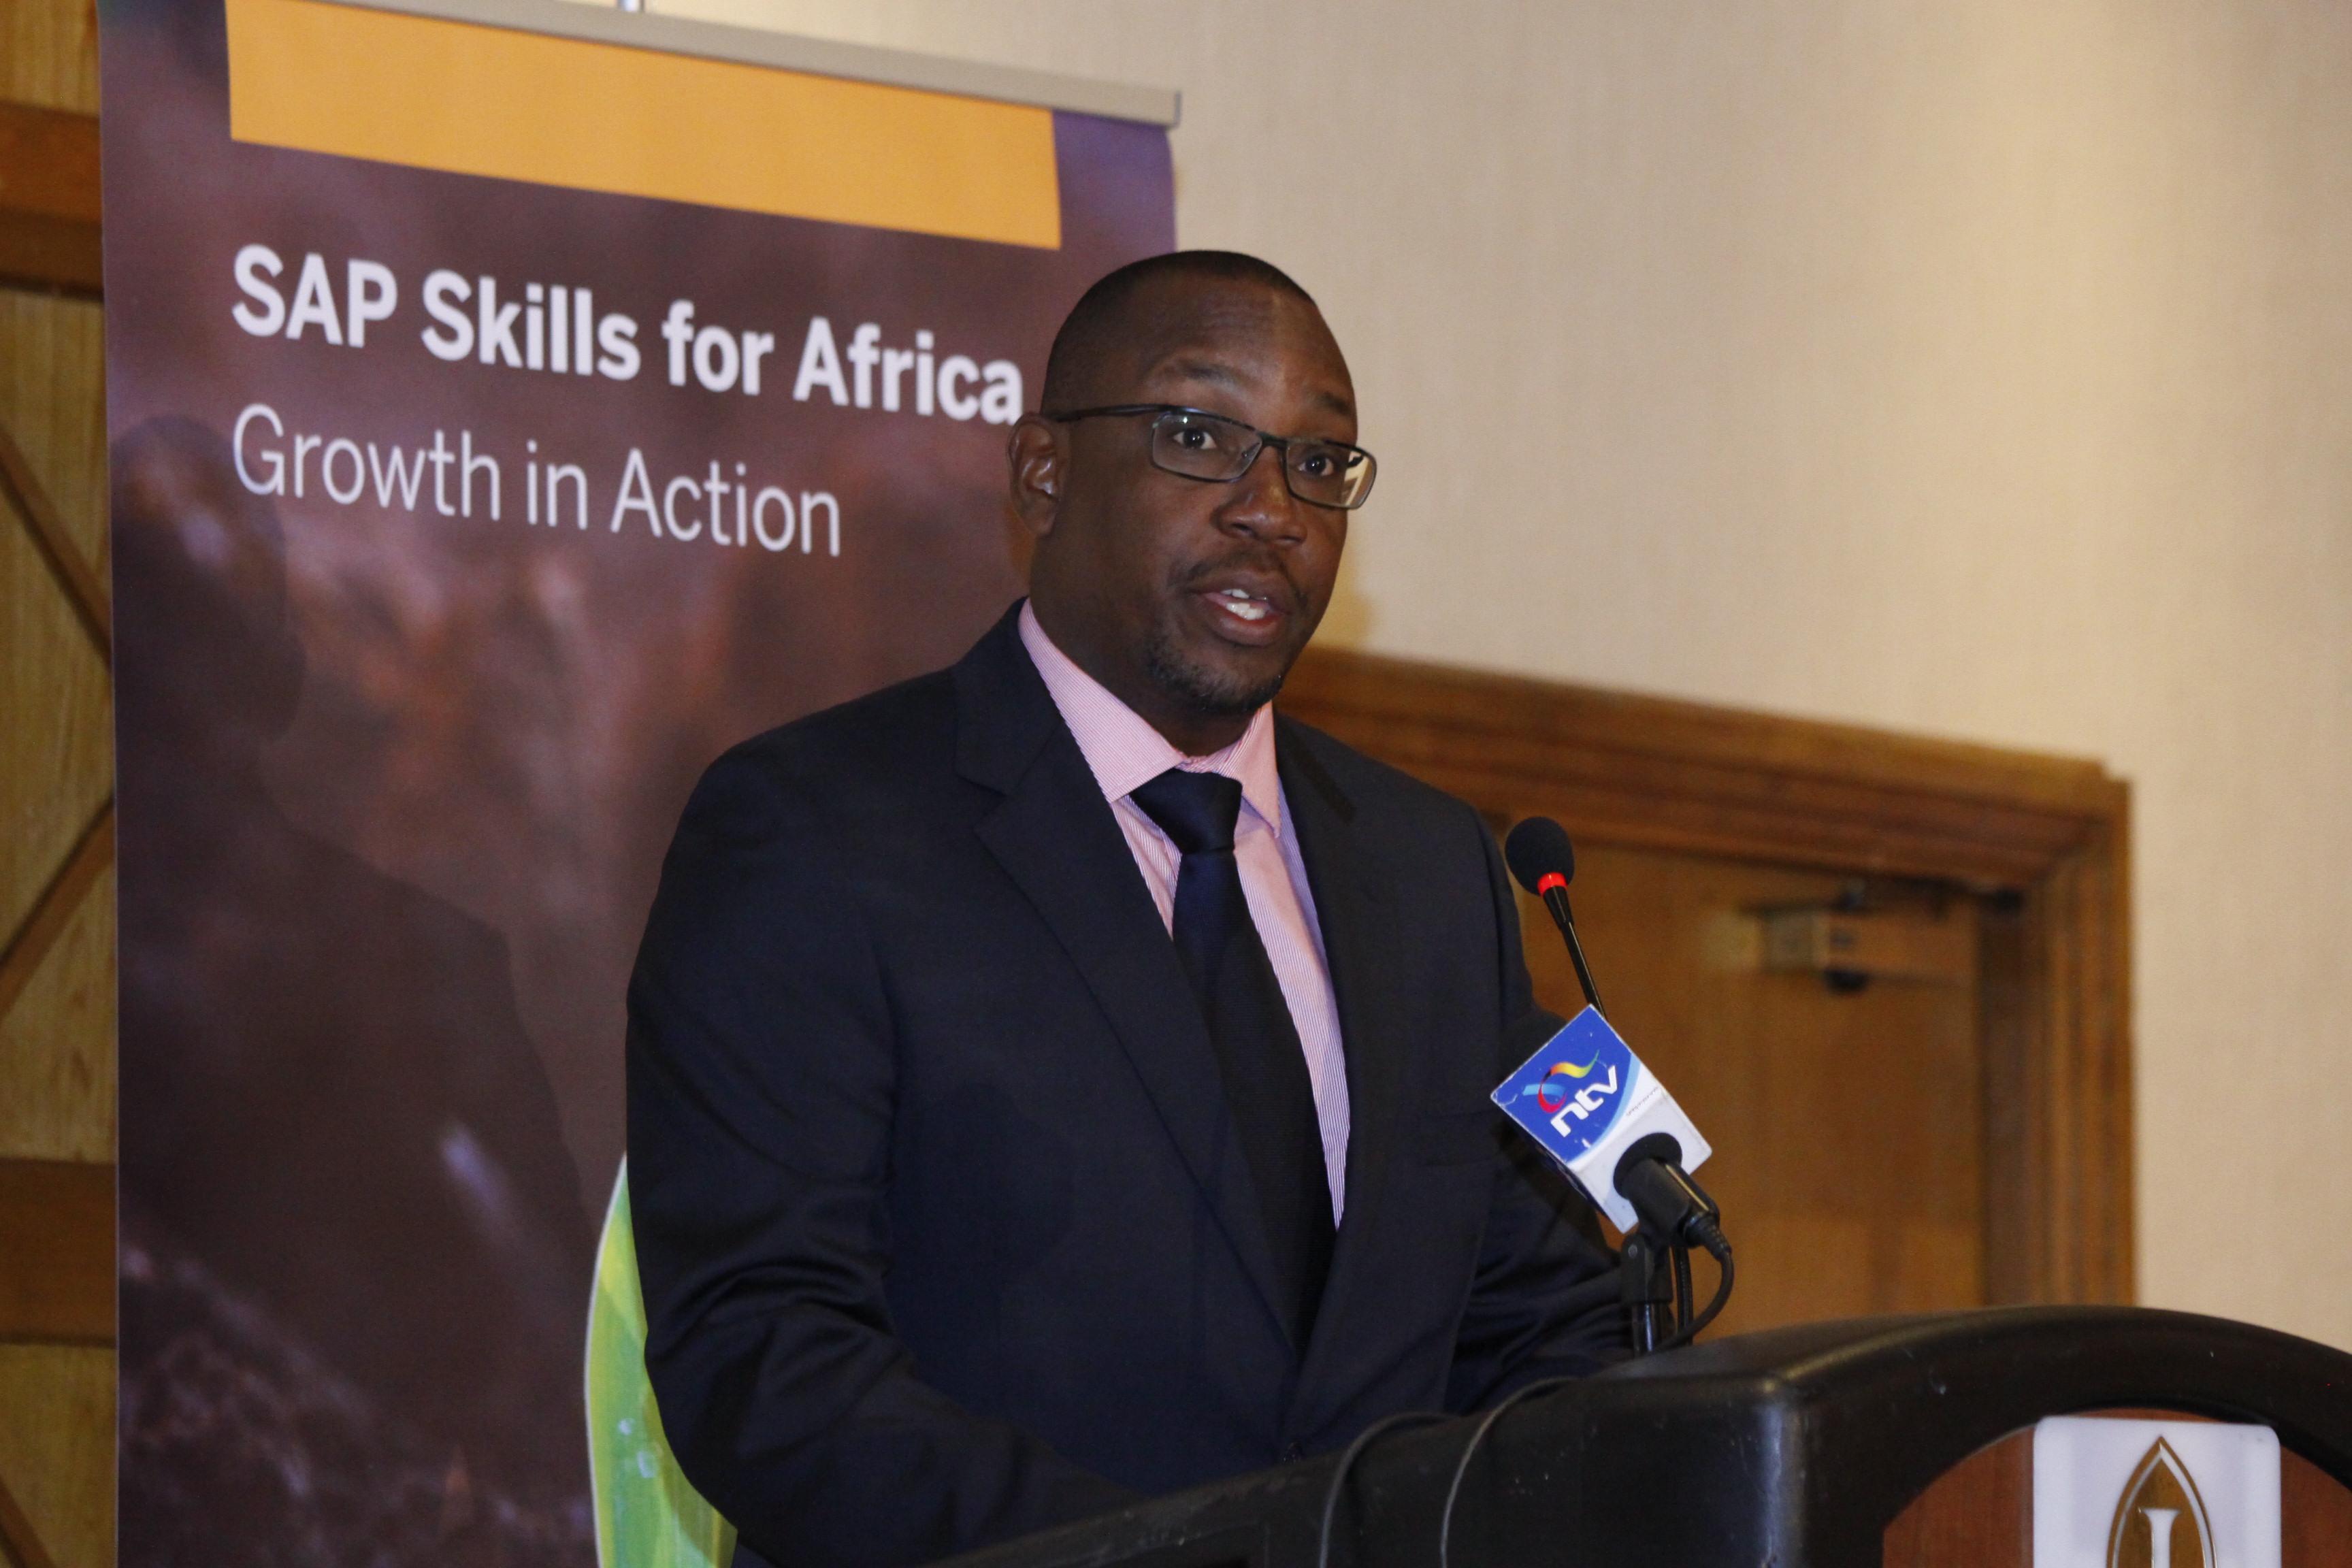 SAP MD, East Africa, Andrew Waititu